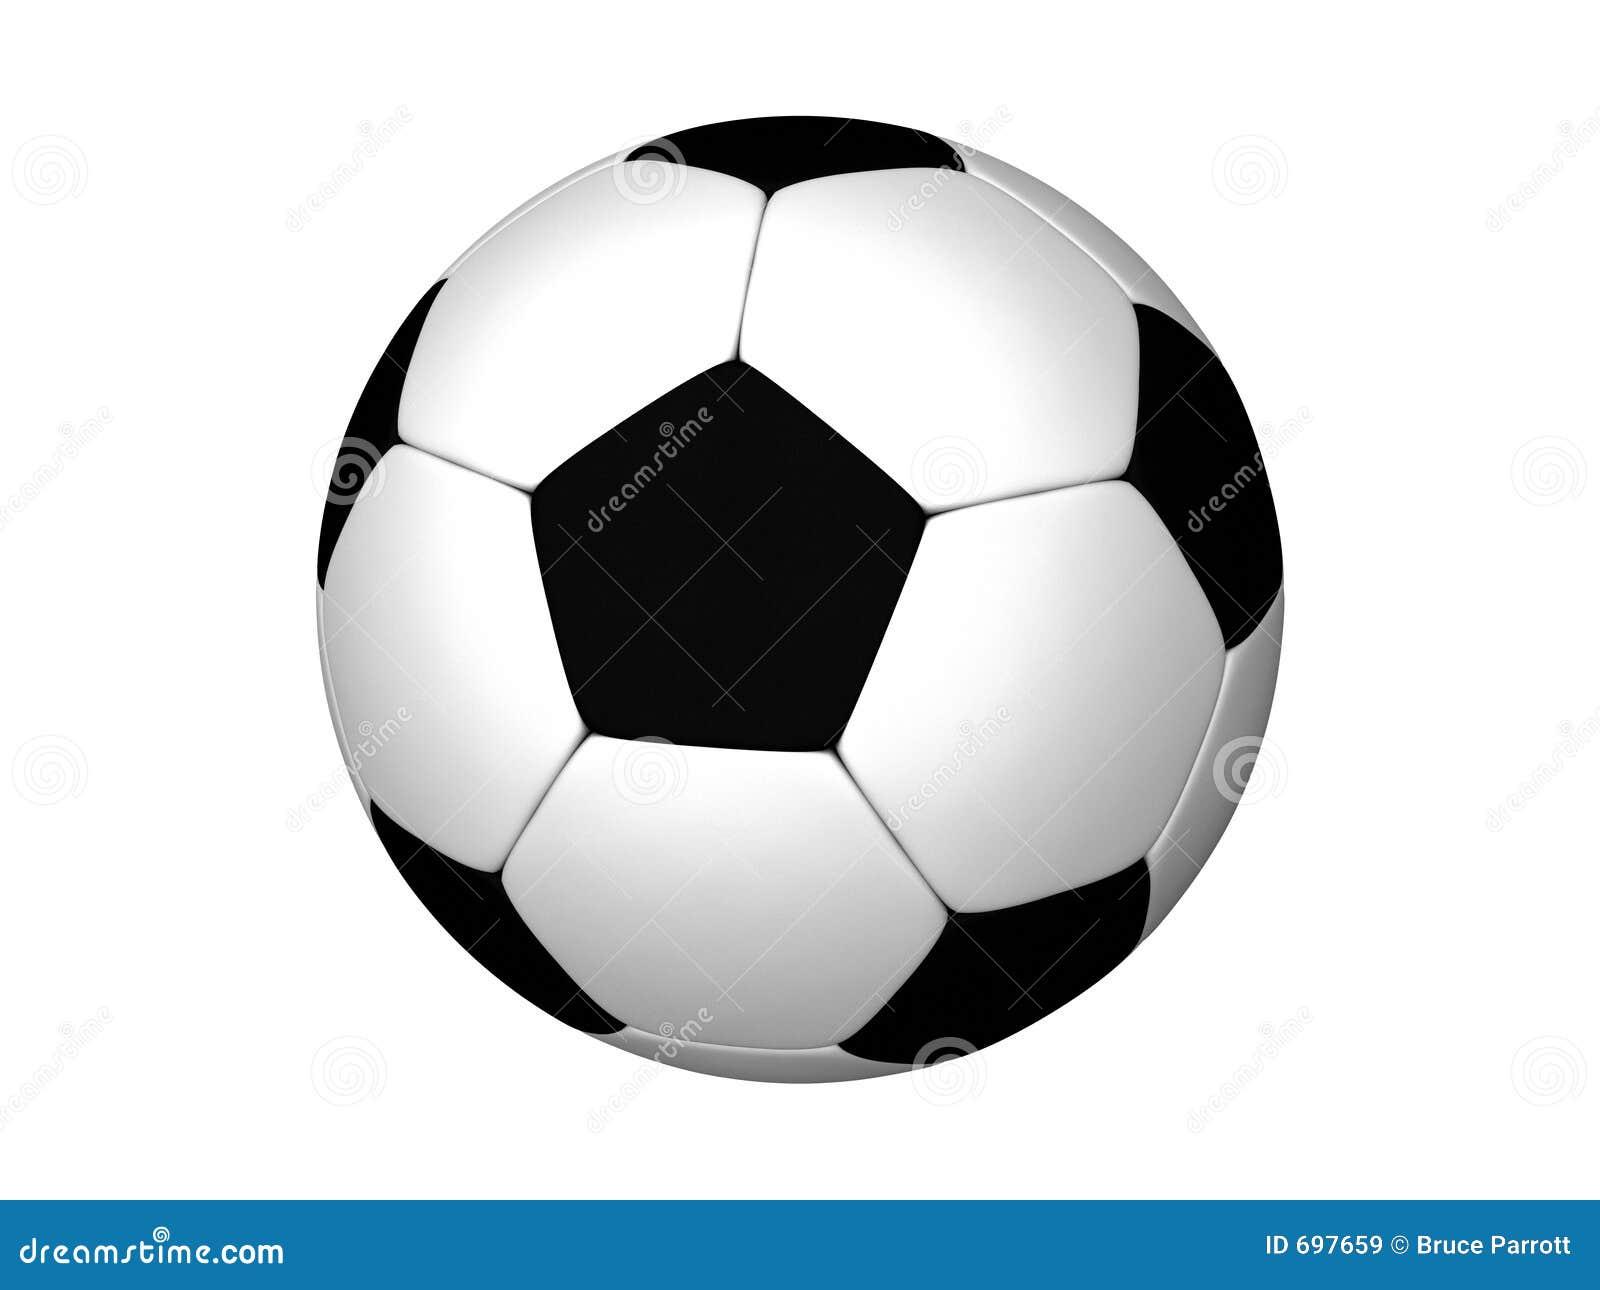 Fútbol o balompié